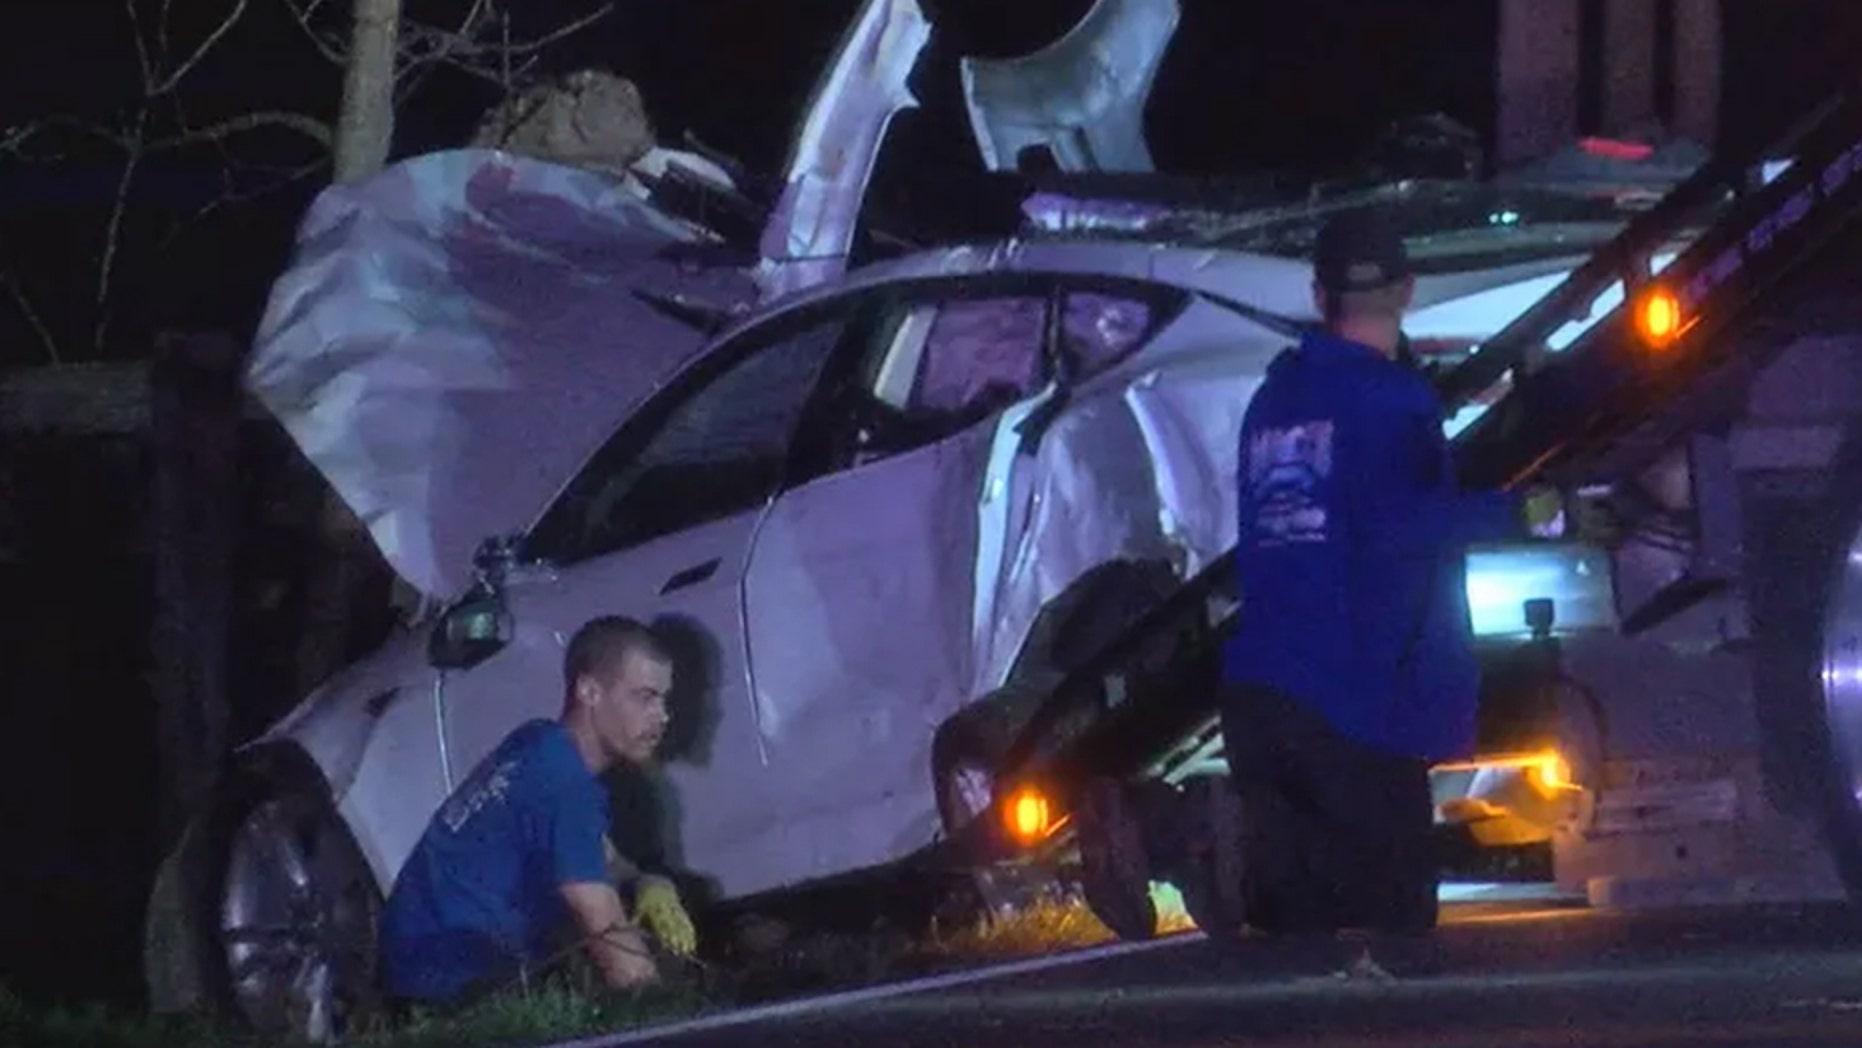 Teens involved in fatal Ohio prom night car crash were